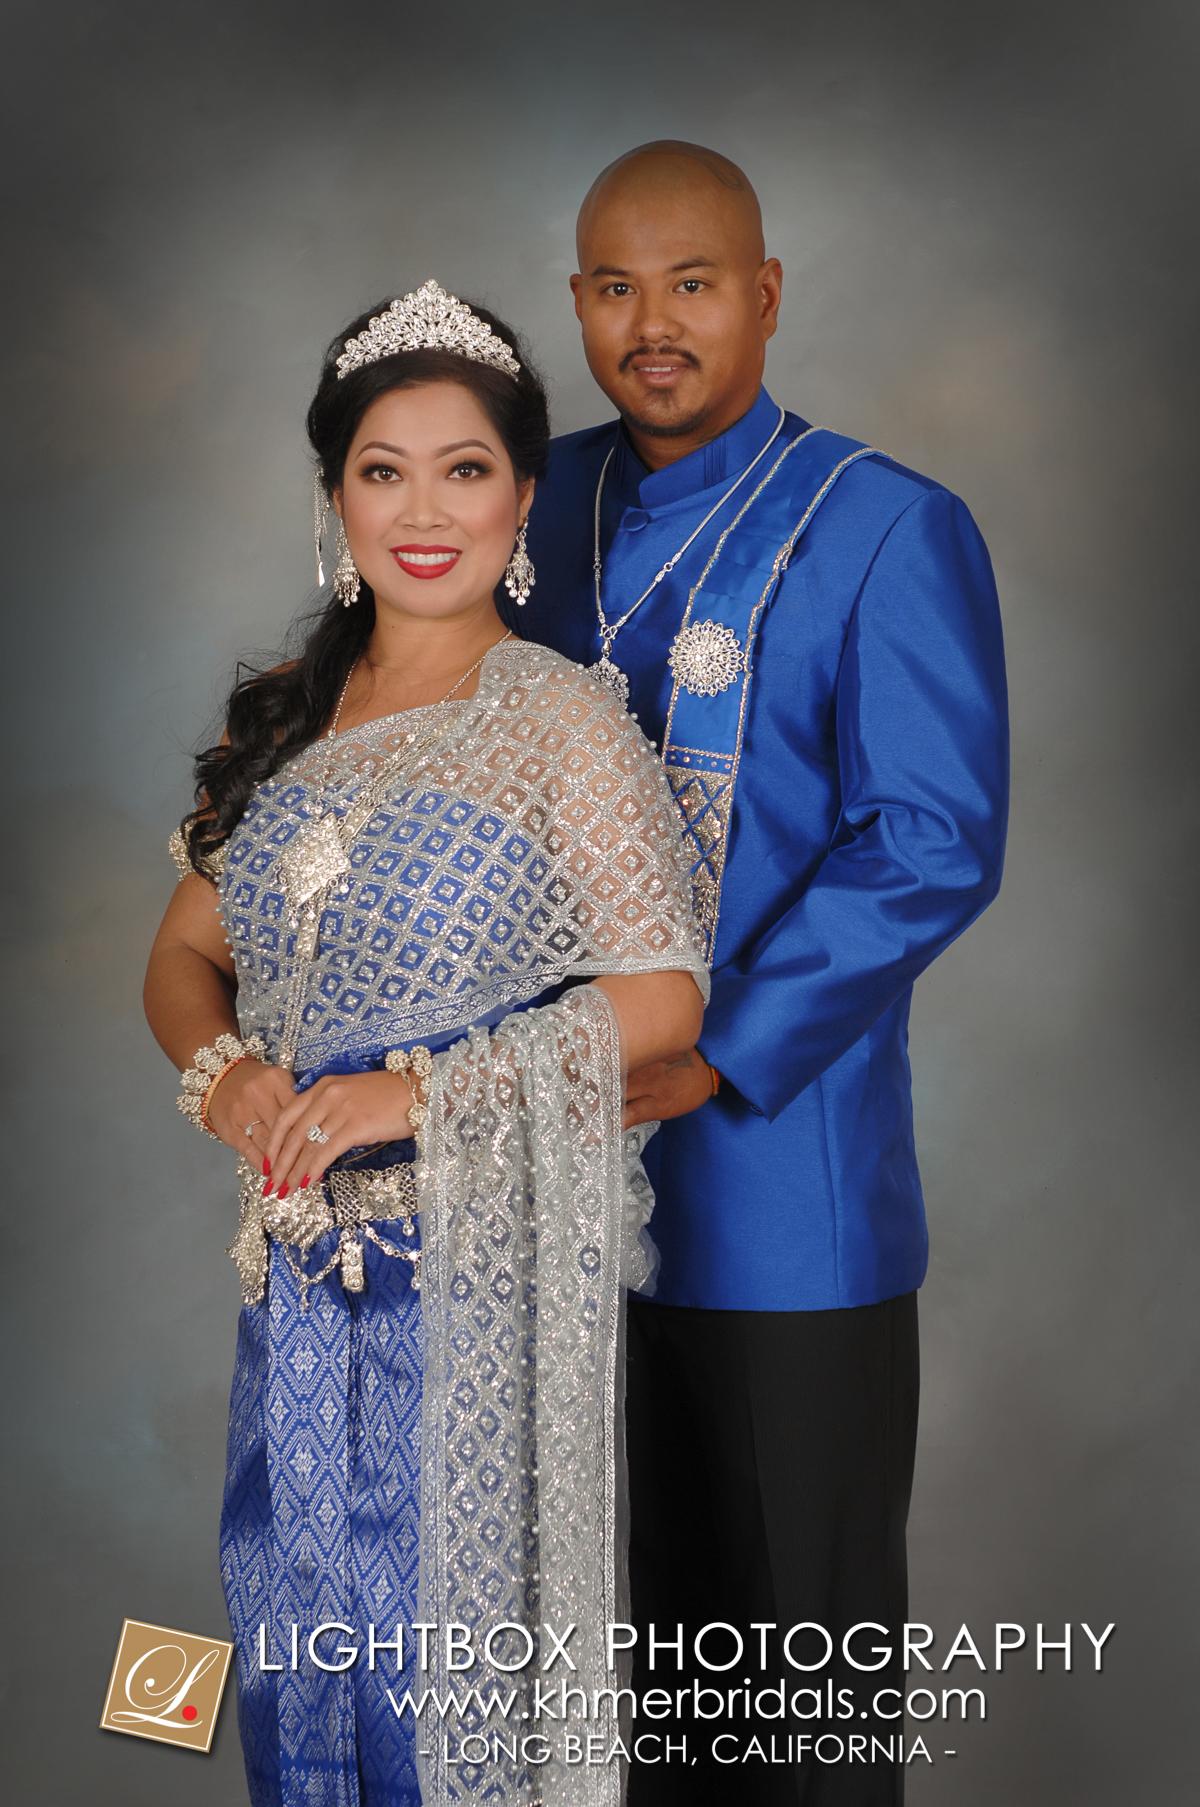 Apsara Khmer Bridal Wedding Photography and video-201.jpg